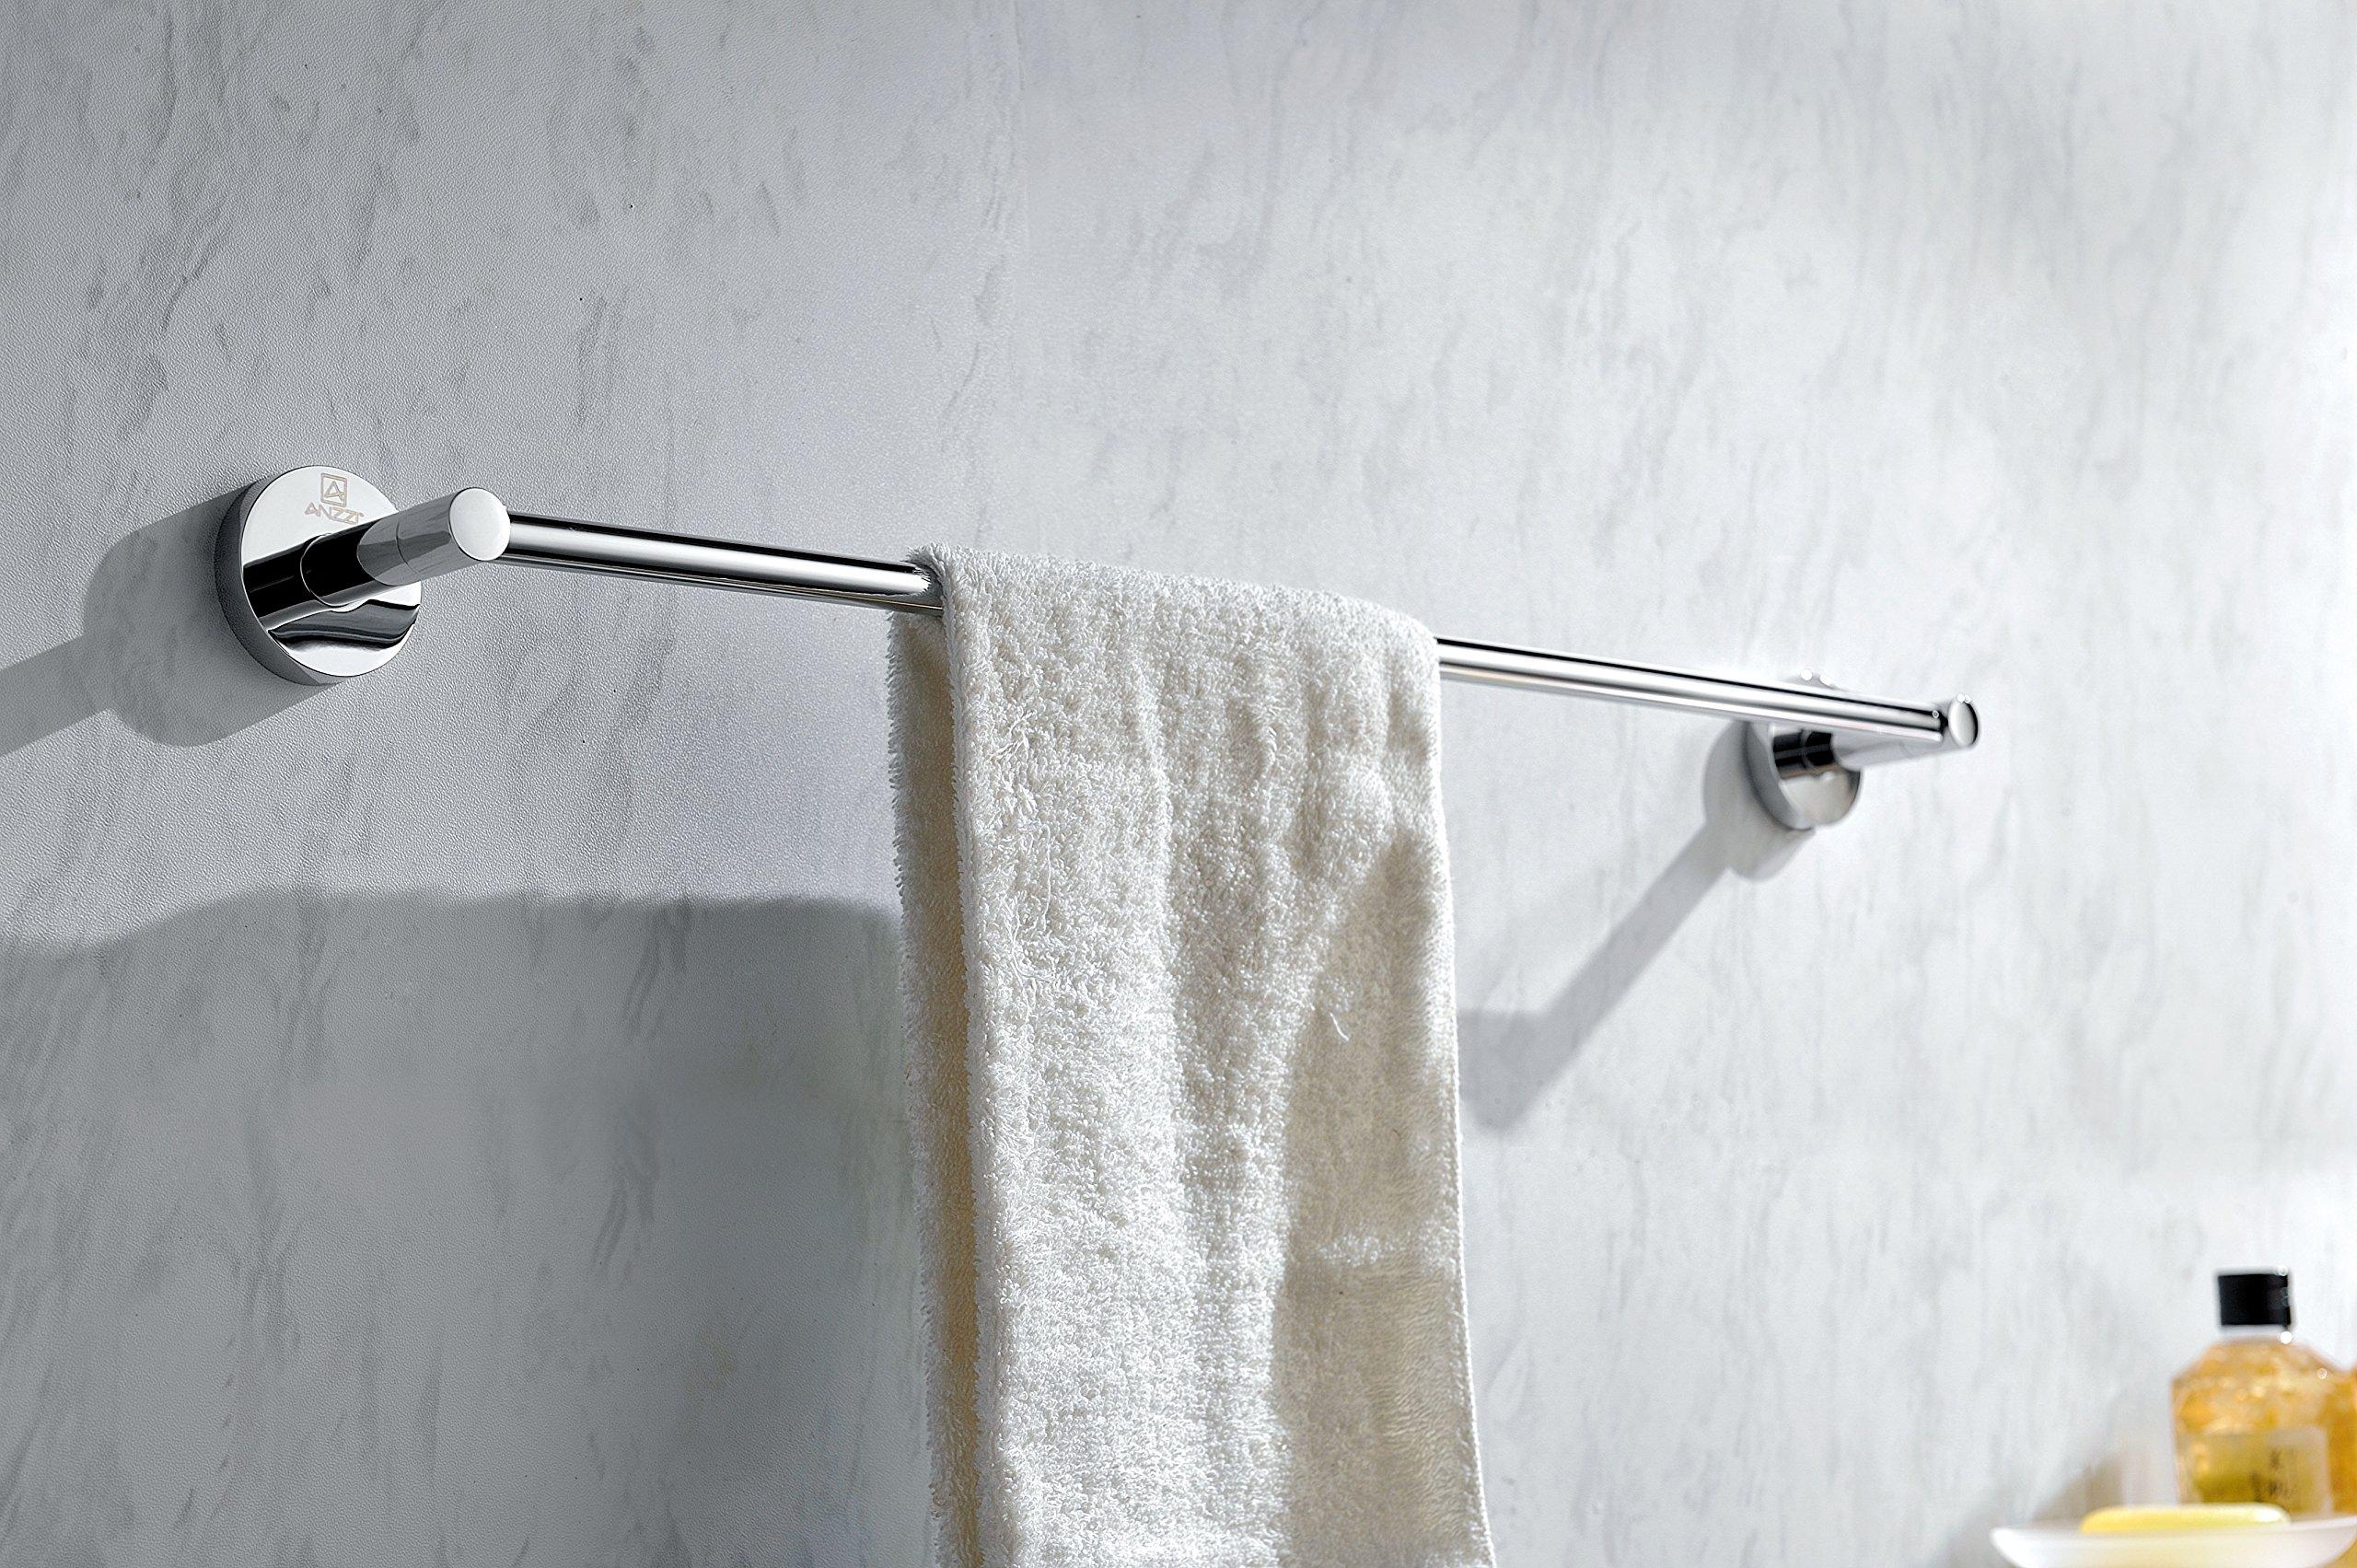 21.69'' Towel Bar - Polished Chrome - Caster Series AC-AZ007 - ANZZI by ANZZI (Image #2)